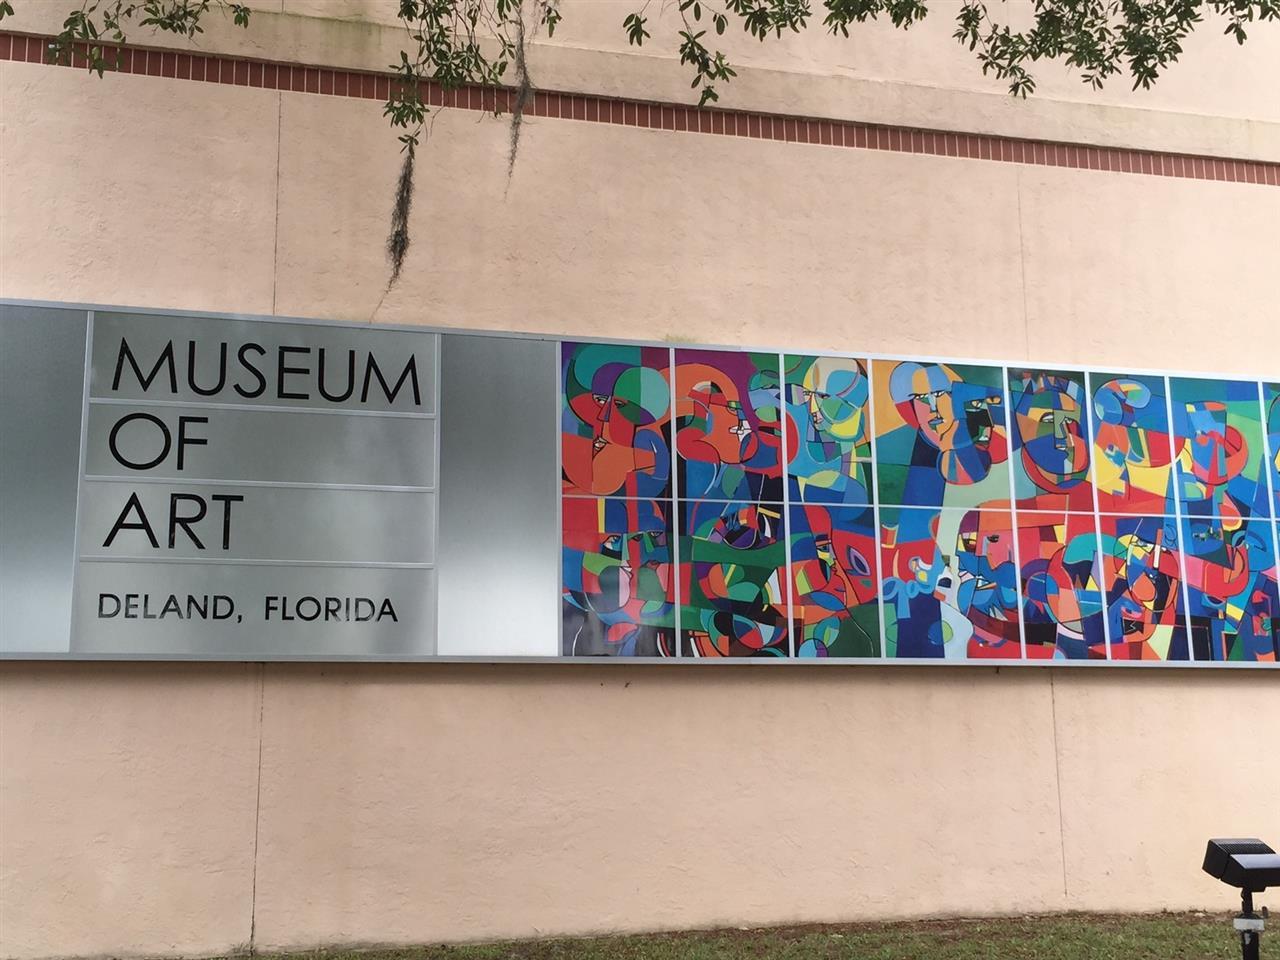 #Deland, FL #Deland Museum of Art